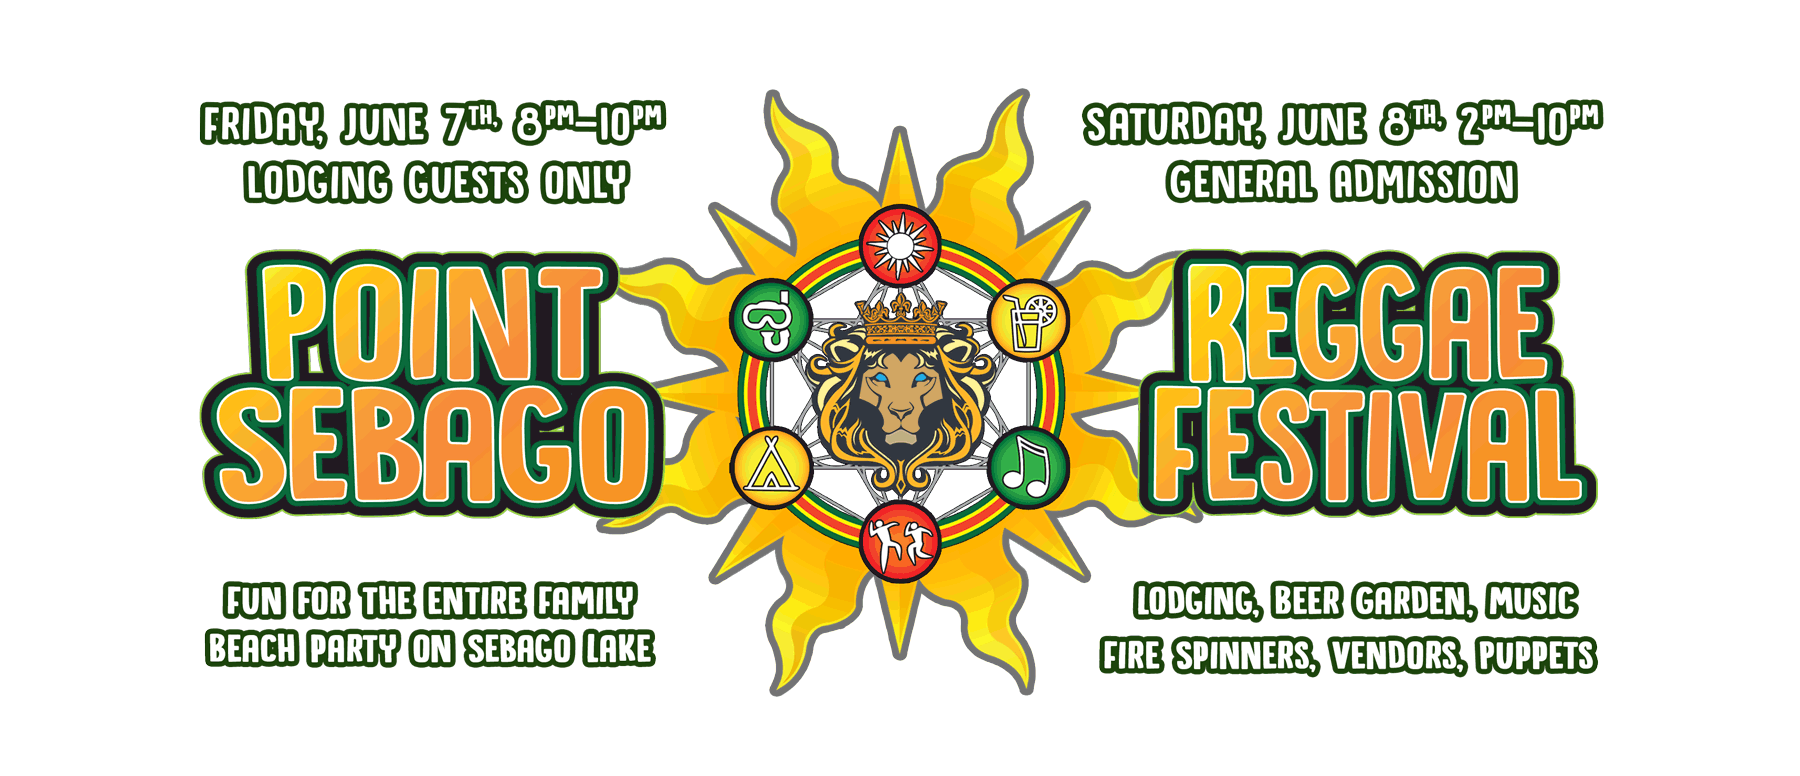 Point Sebago Reggae Festival